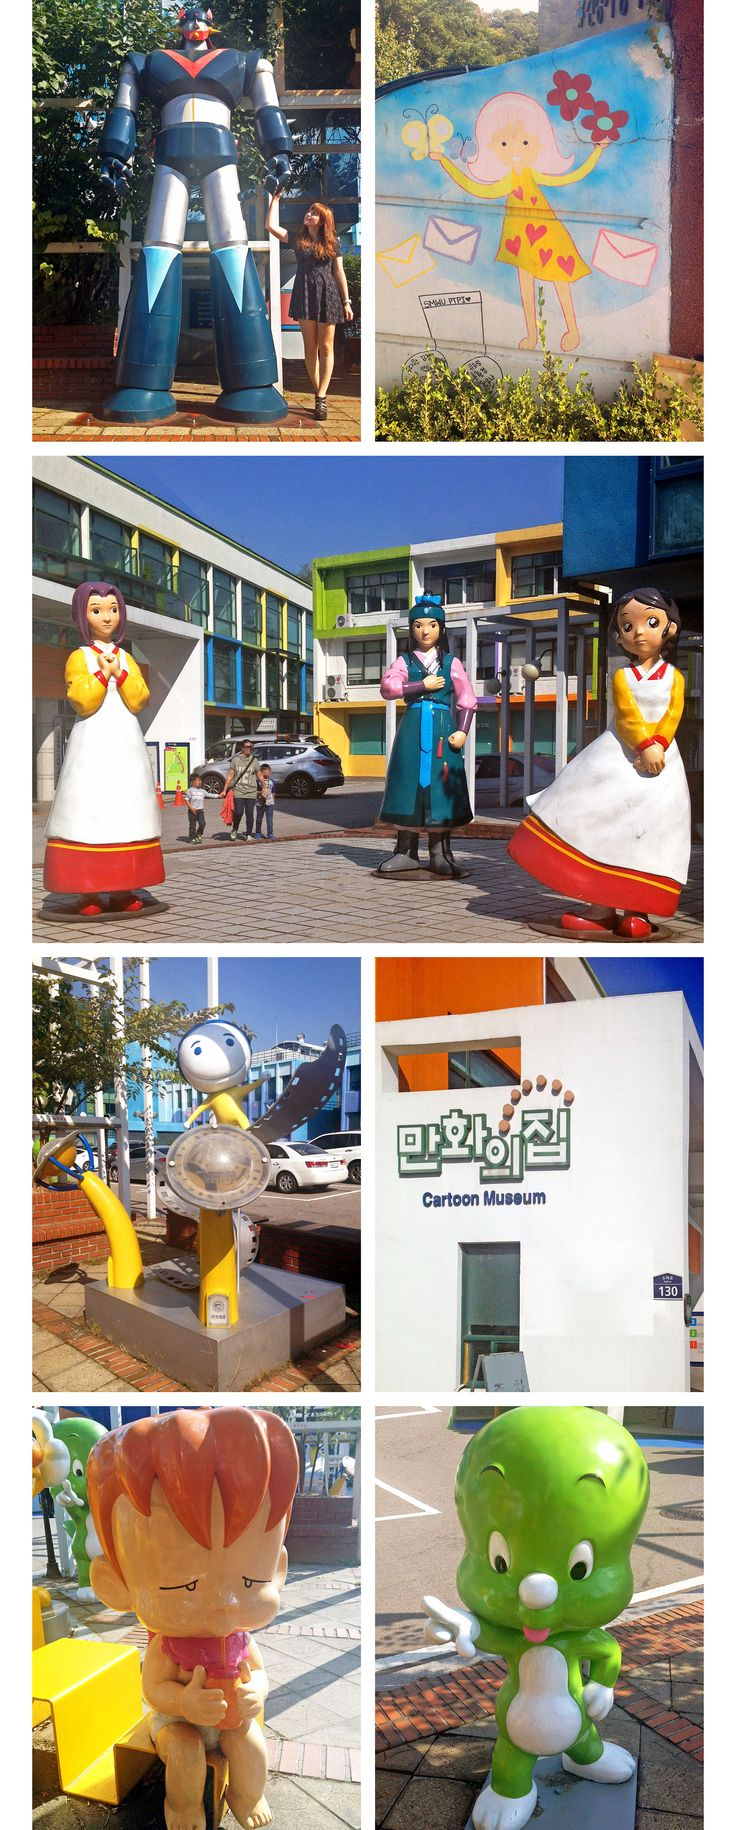 Seoul Cartoon Museum, South Korea